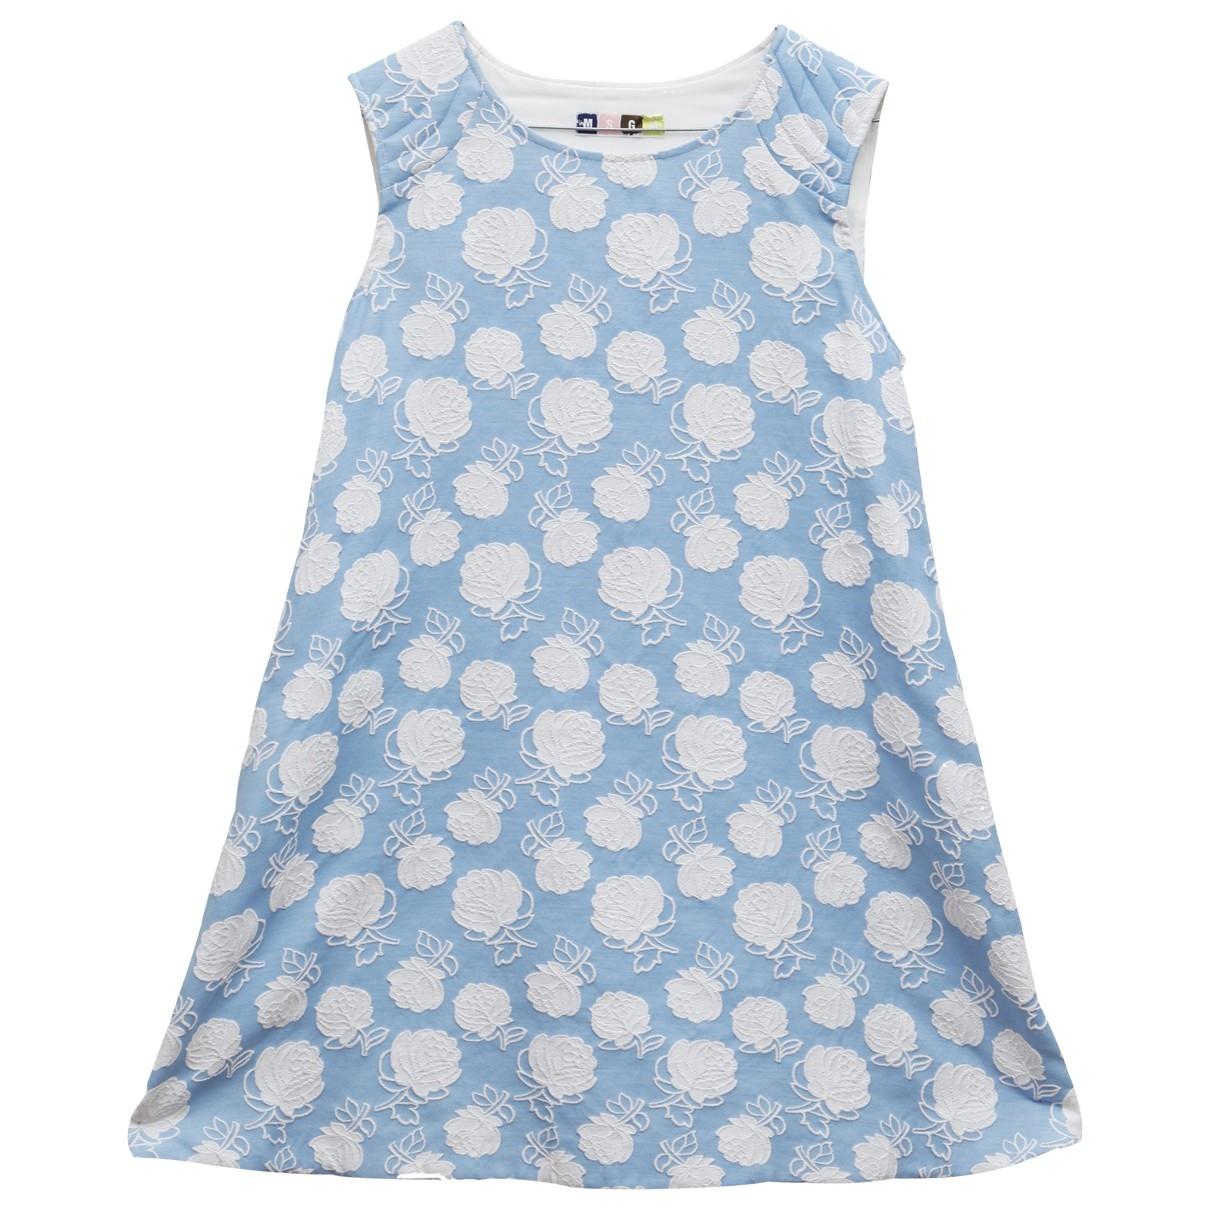 Msgm \N Blue Cotton dress for Women 40 IT